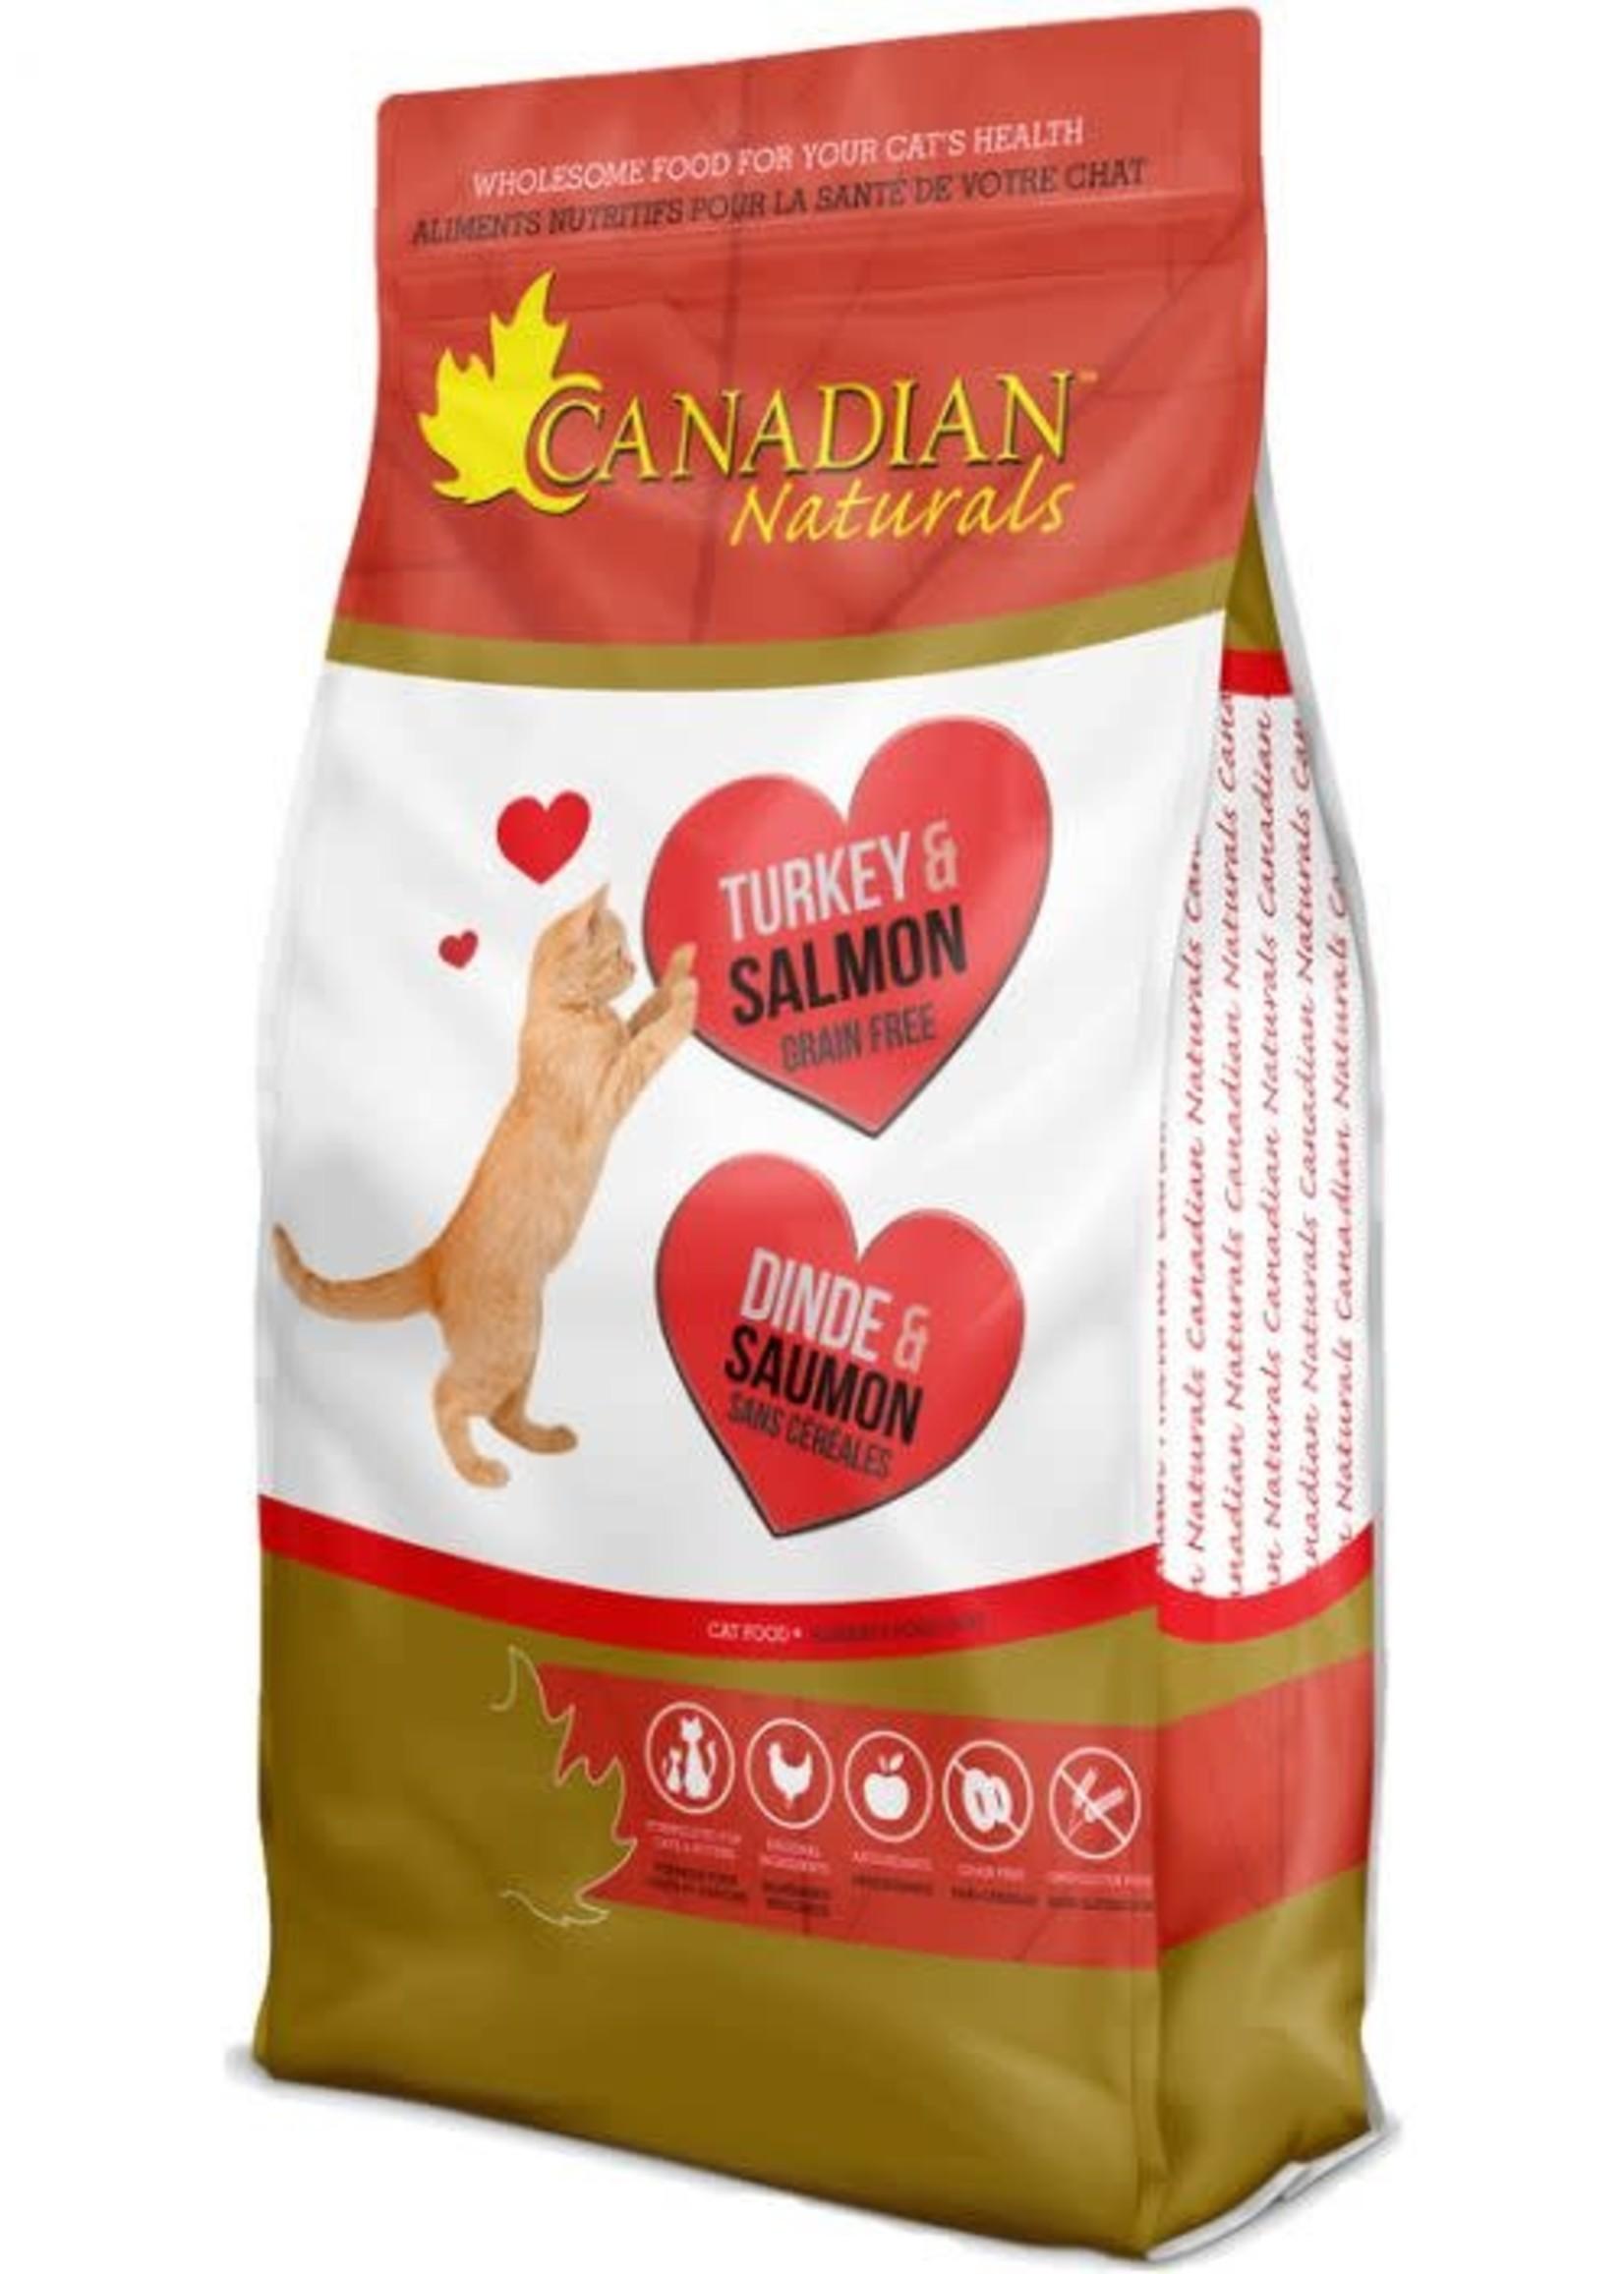 Canadian Naturals® CANADIAN NATURALS GRAIN FREE TURKEY & SALMON 15lbs